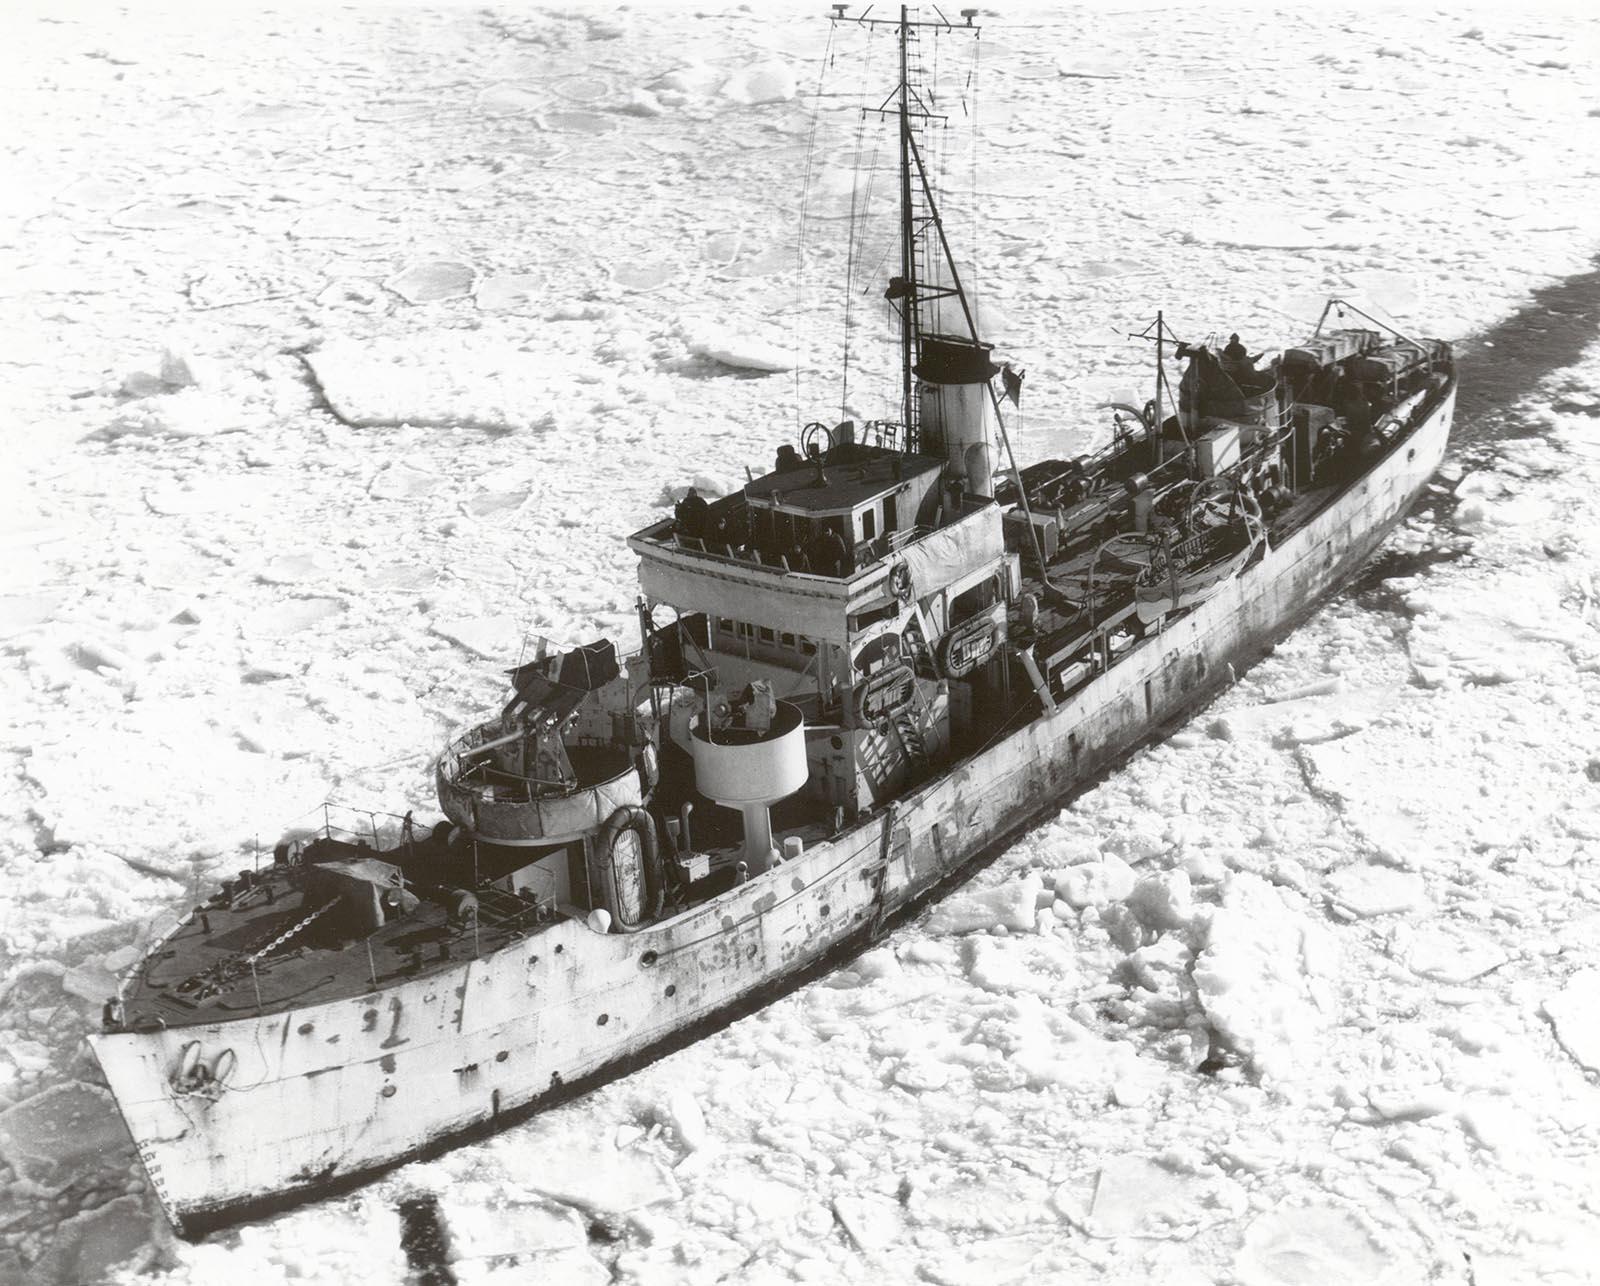 HMCS LISCOMB